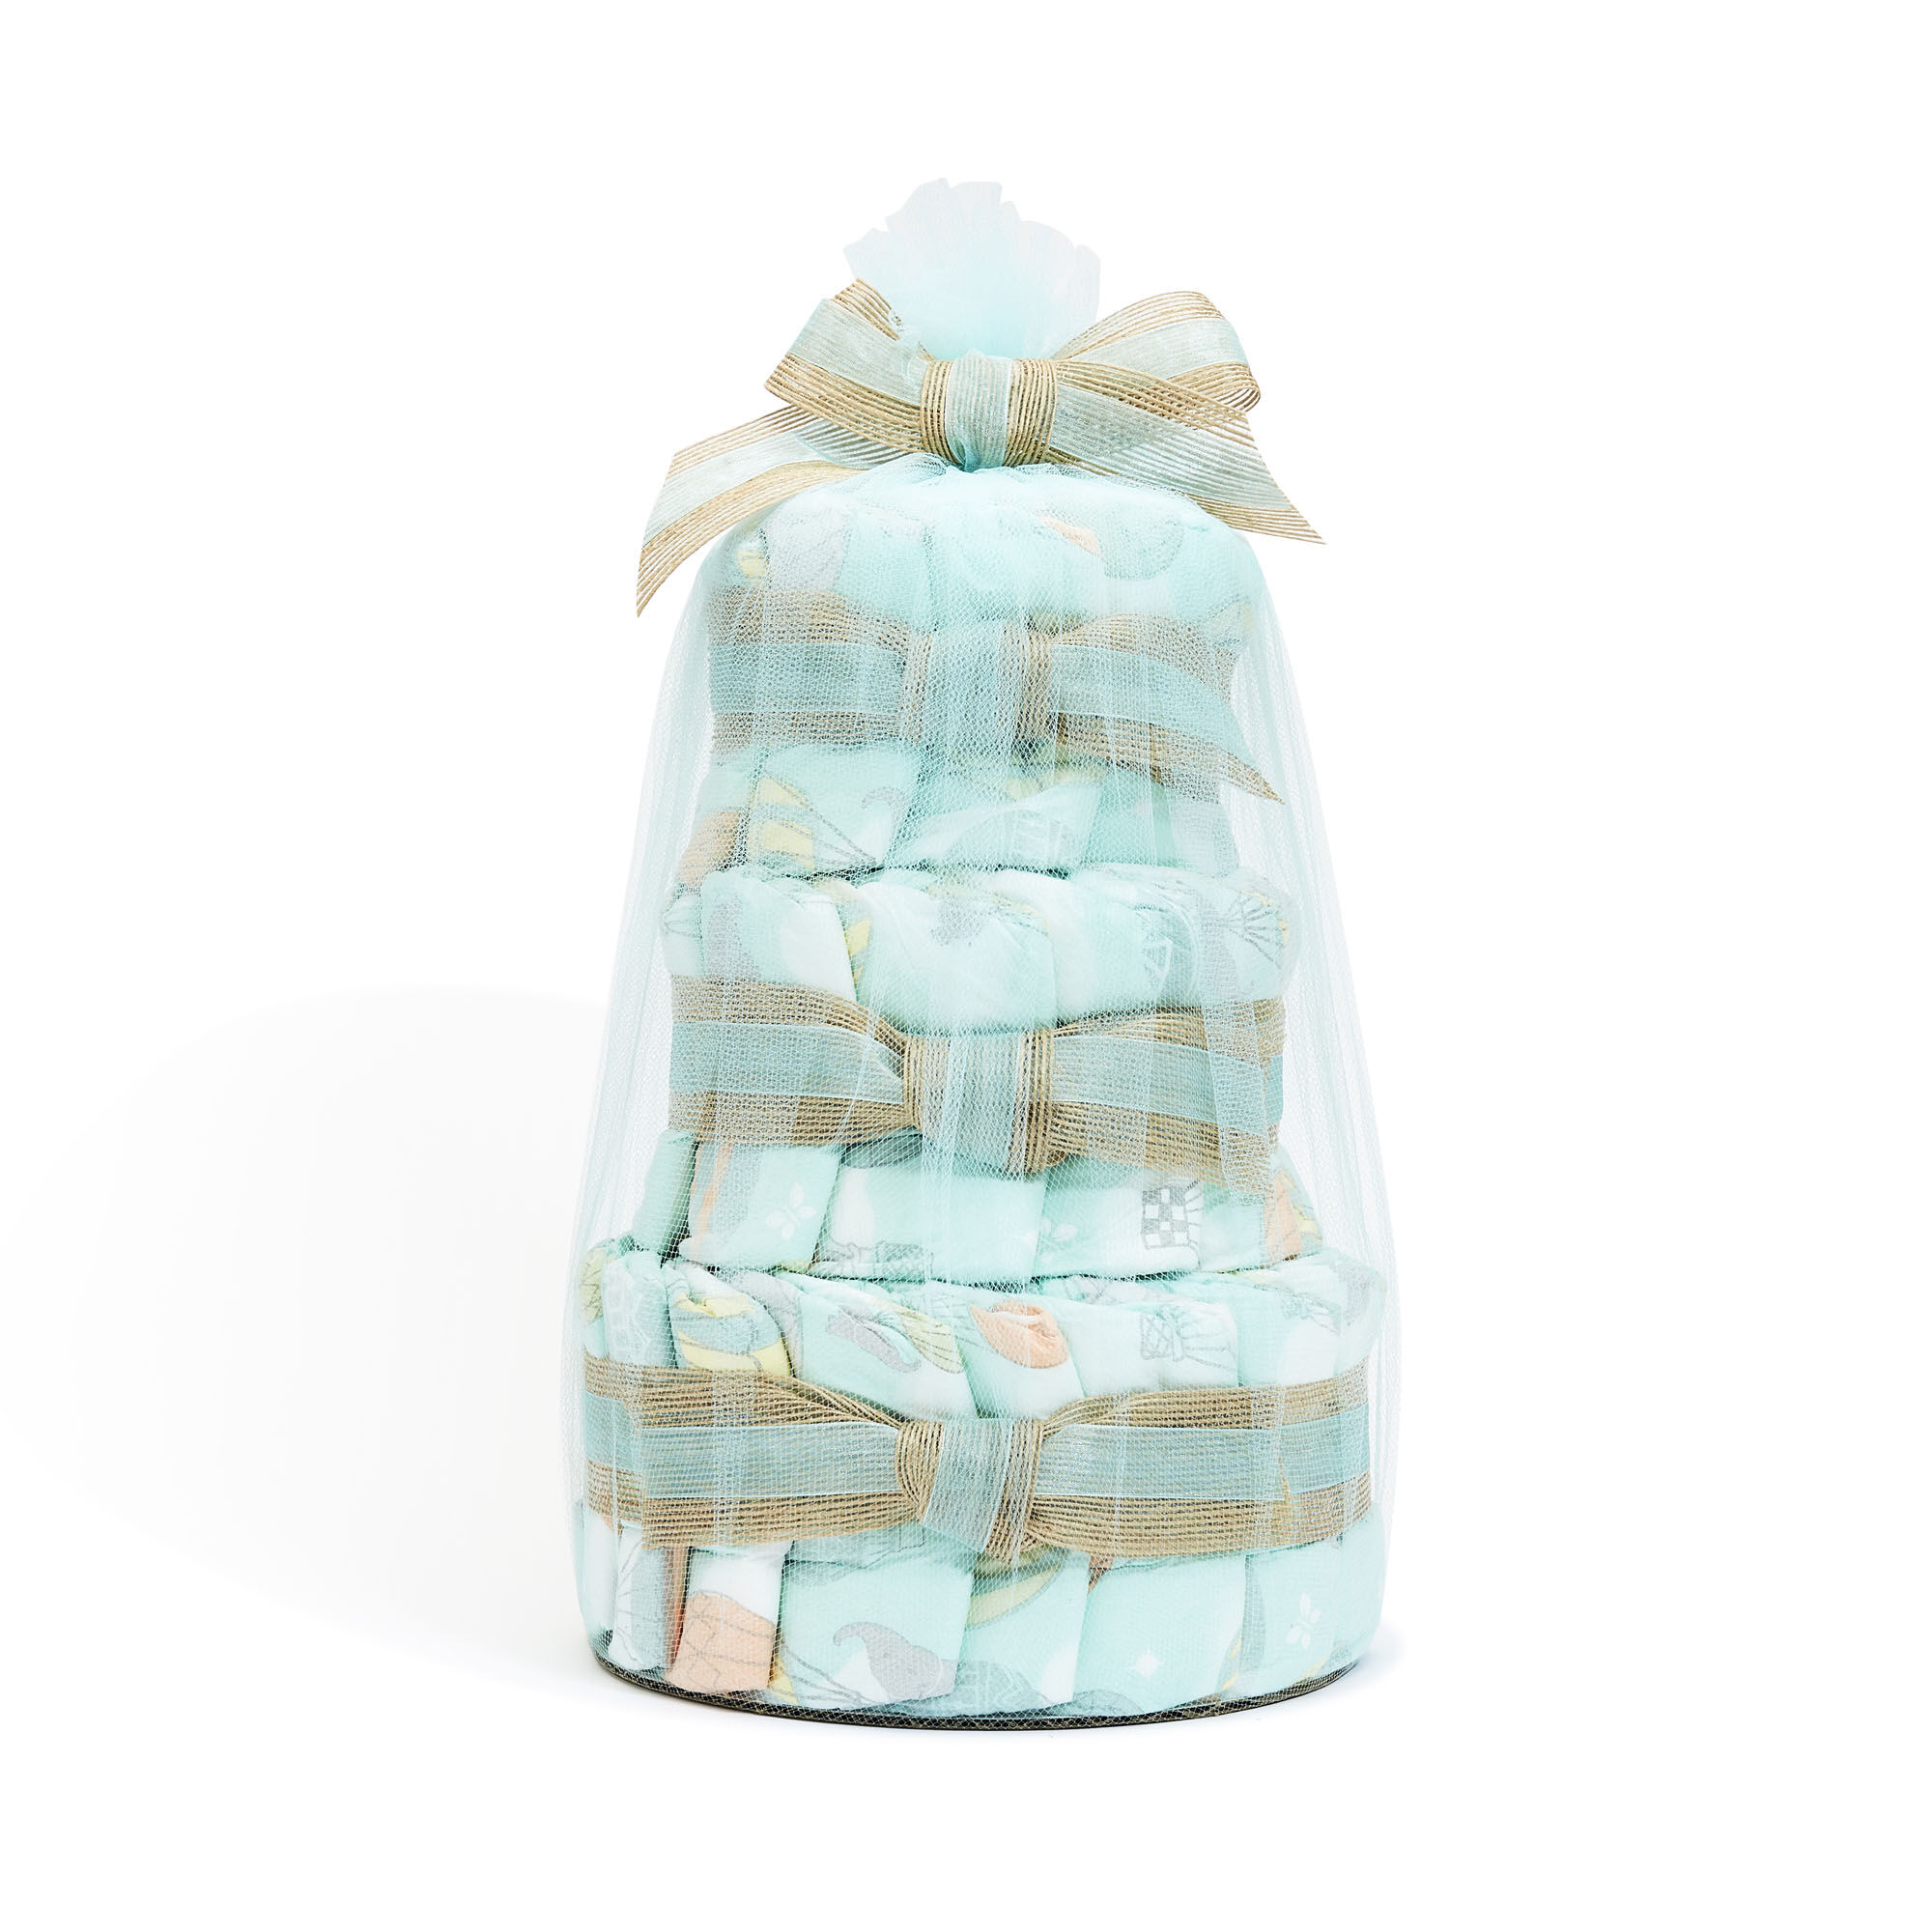 Mini Clean Conscious Diaper Cake, Above It All